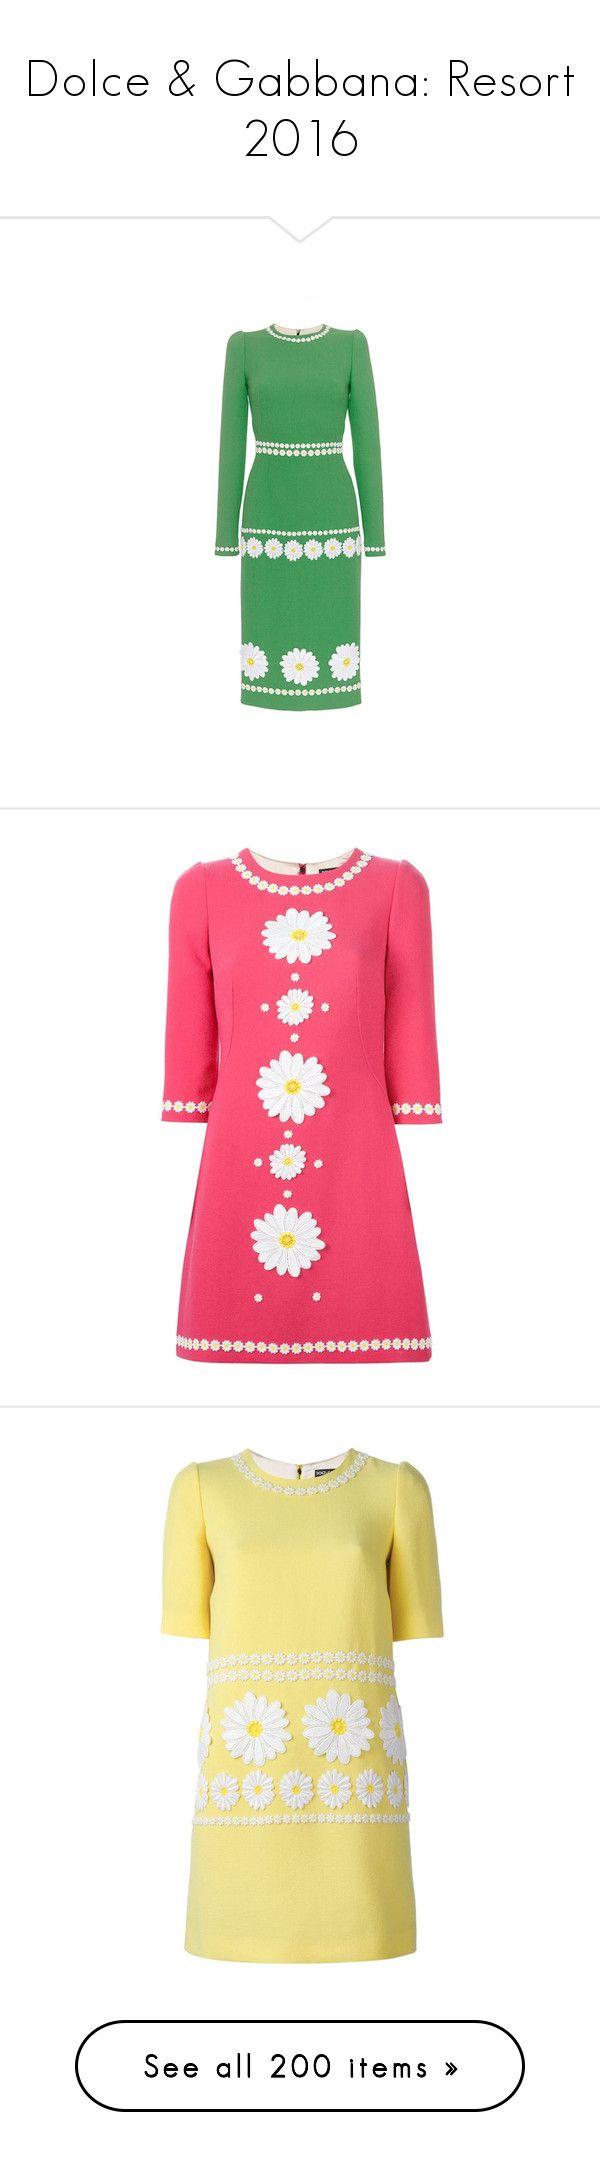 """Dolce & Gabbana: Resort 2016"" by livnd ❤ liked on Polyvore featuring Dolce, Resort2016, livndfashion, livnddolceandgabbana, dresses, pink circle skirt, 3/4 sleeve dresses, pink skater skirt, flared skirt and skater skirt"